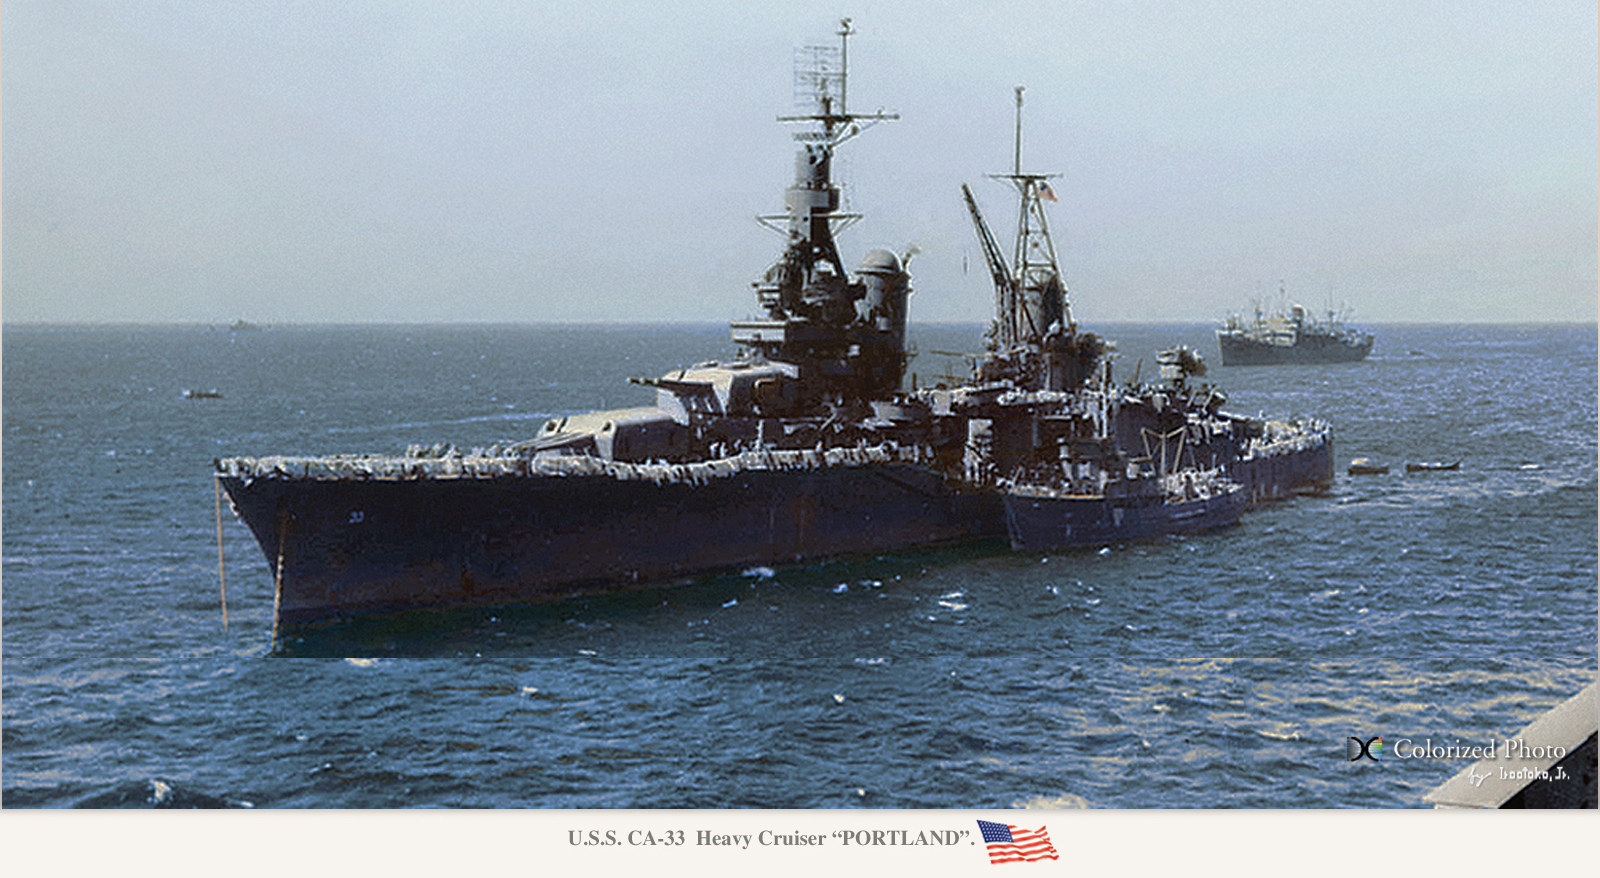 USS Portland, colorized by Hirootoko JR.